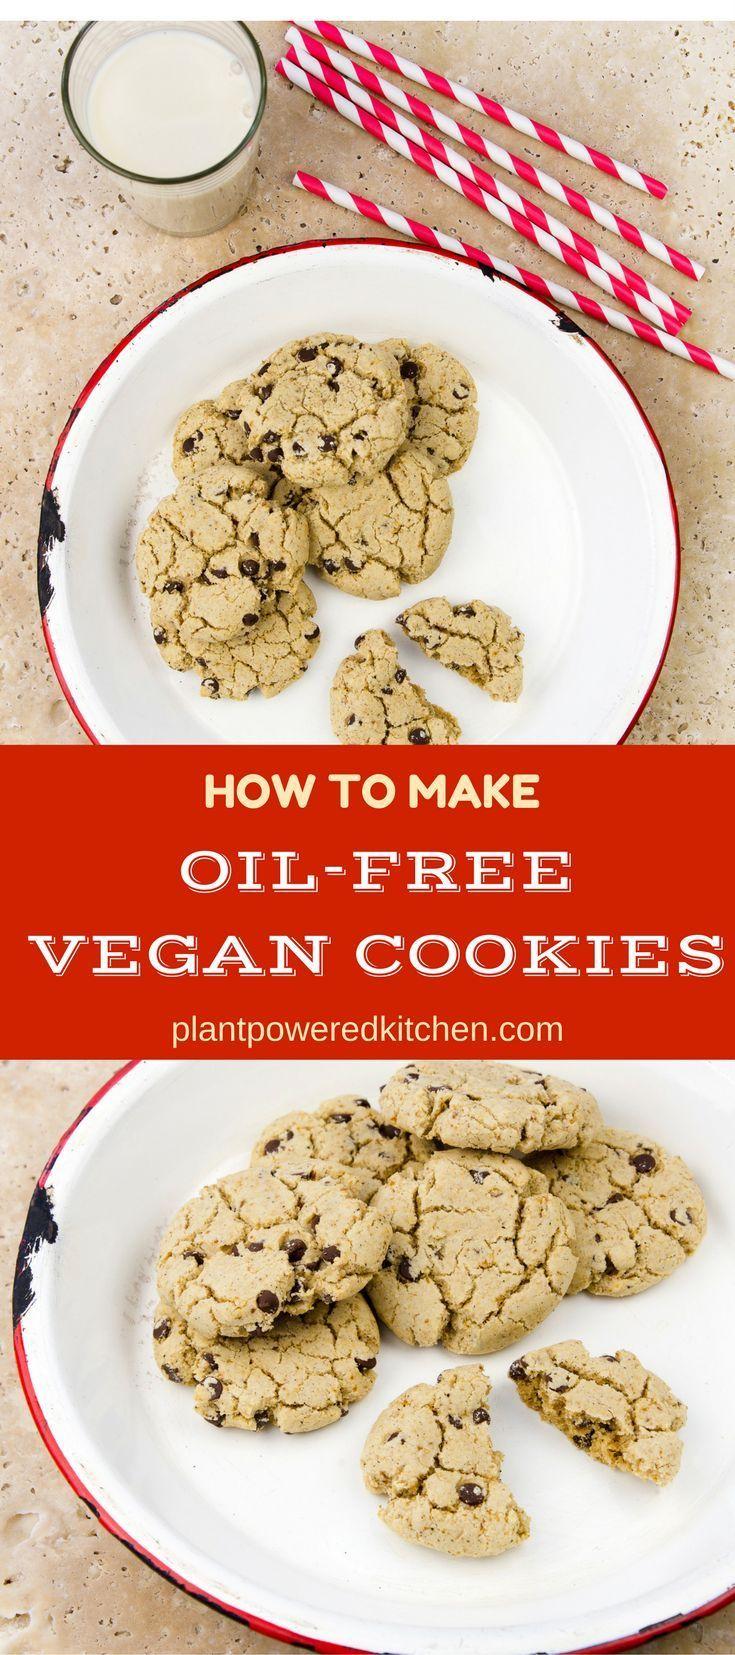 Learn Dreena's expert tips to make delicious oil-free vegan cookies! Applesauce is not the answer - get the tricks to make your oil-free cookies a hit! plantpoweredkitchen.com